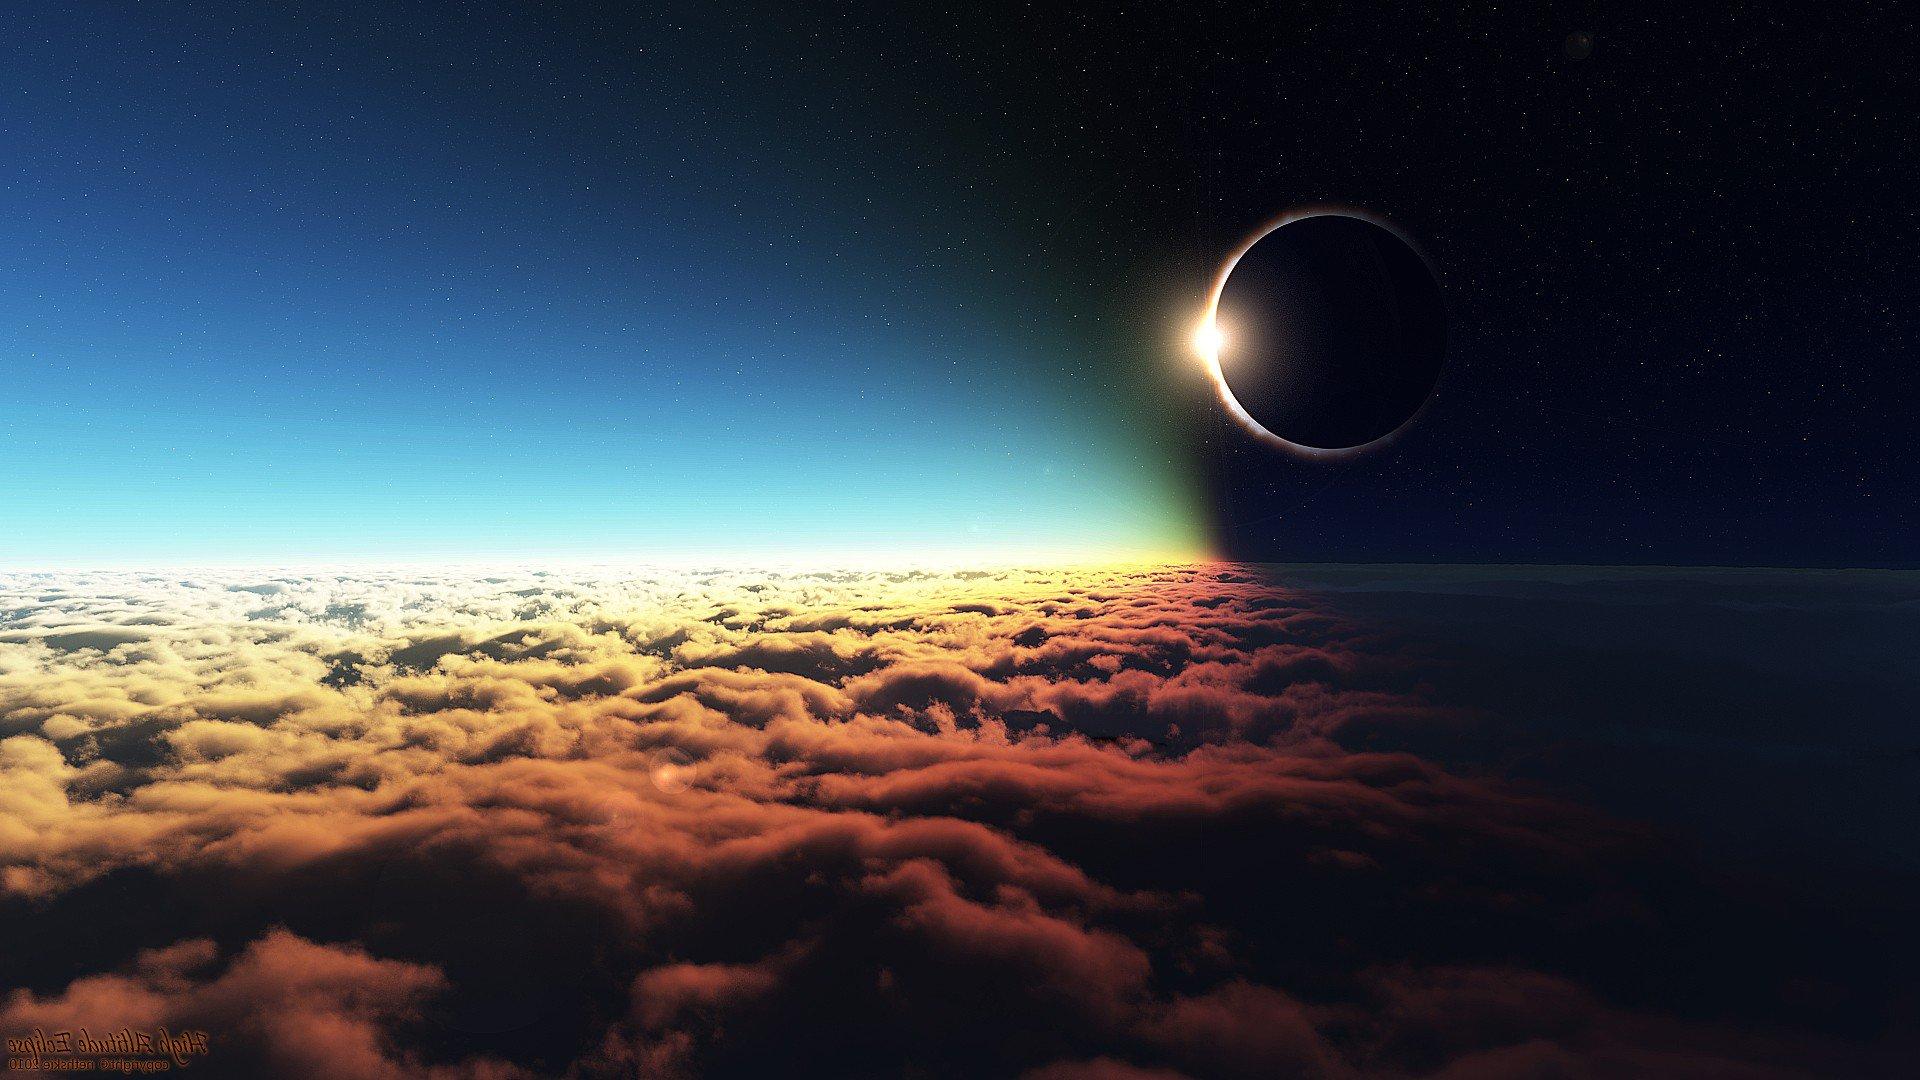 Space Universe Eclipse Hd Wallpapers Desktop: Eclipse Altitude, HD Digital Universe, 4k Wallpapers